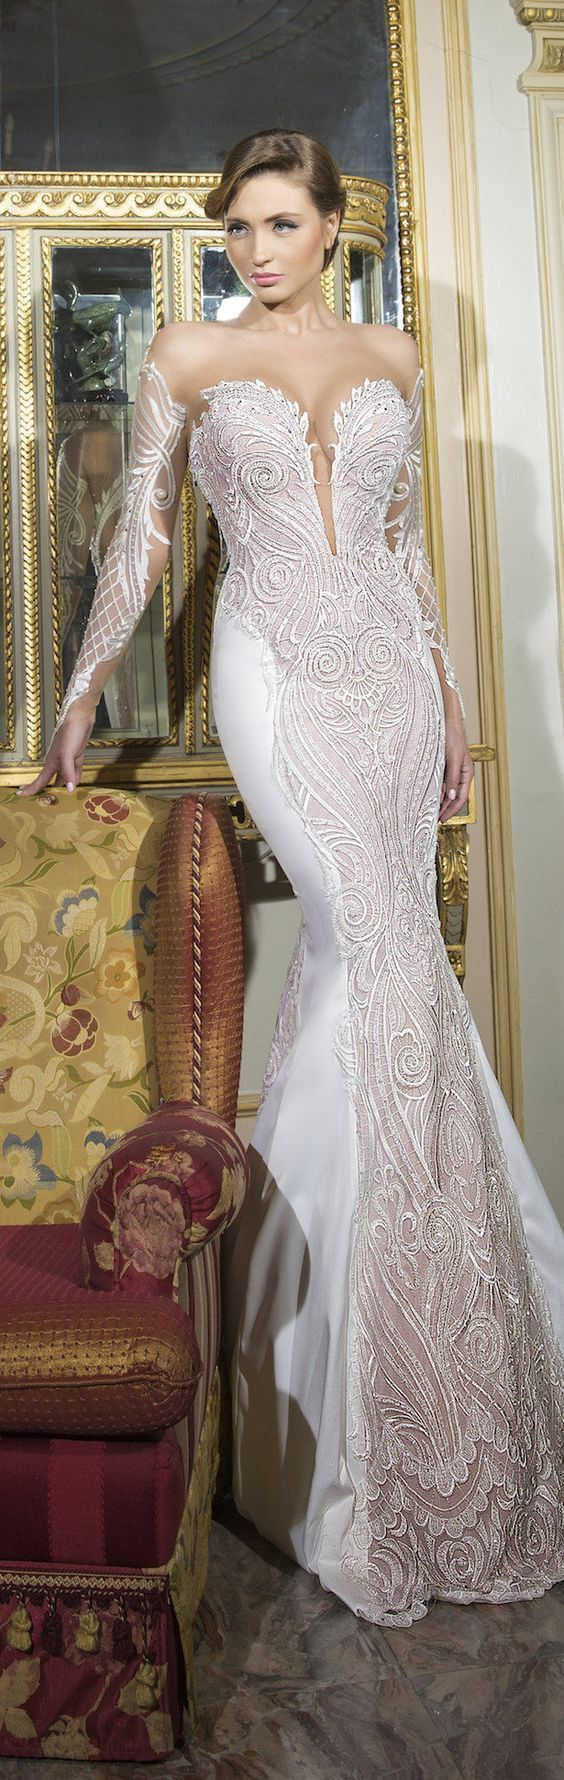 Shabi & Israel Haute Couture 2016 Long Sleeves Wedding Dress / http://www.himisspuff.com/long-sleeve-wedding-dresses/16/